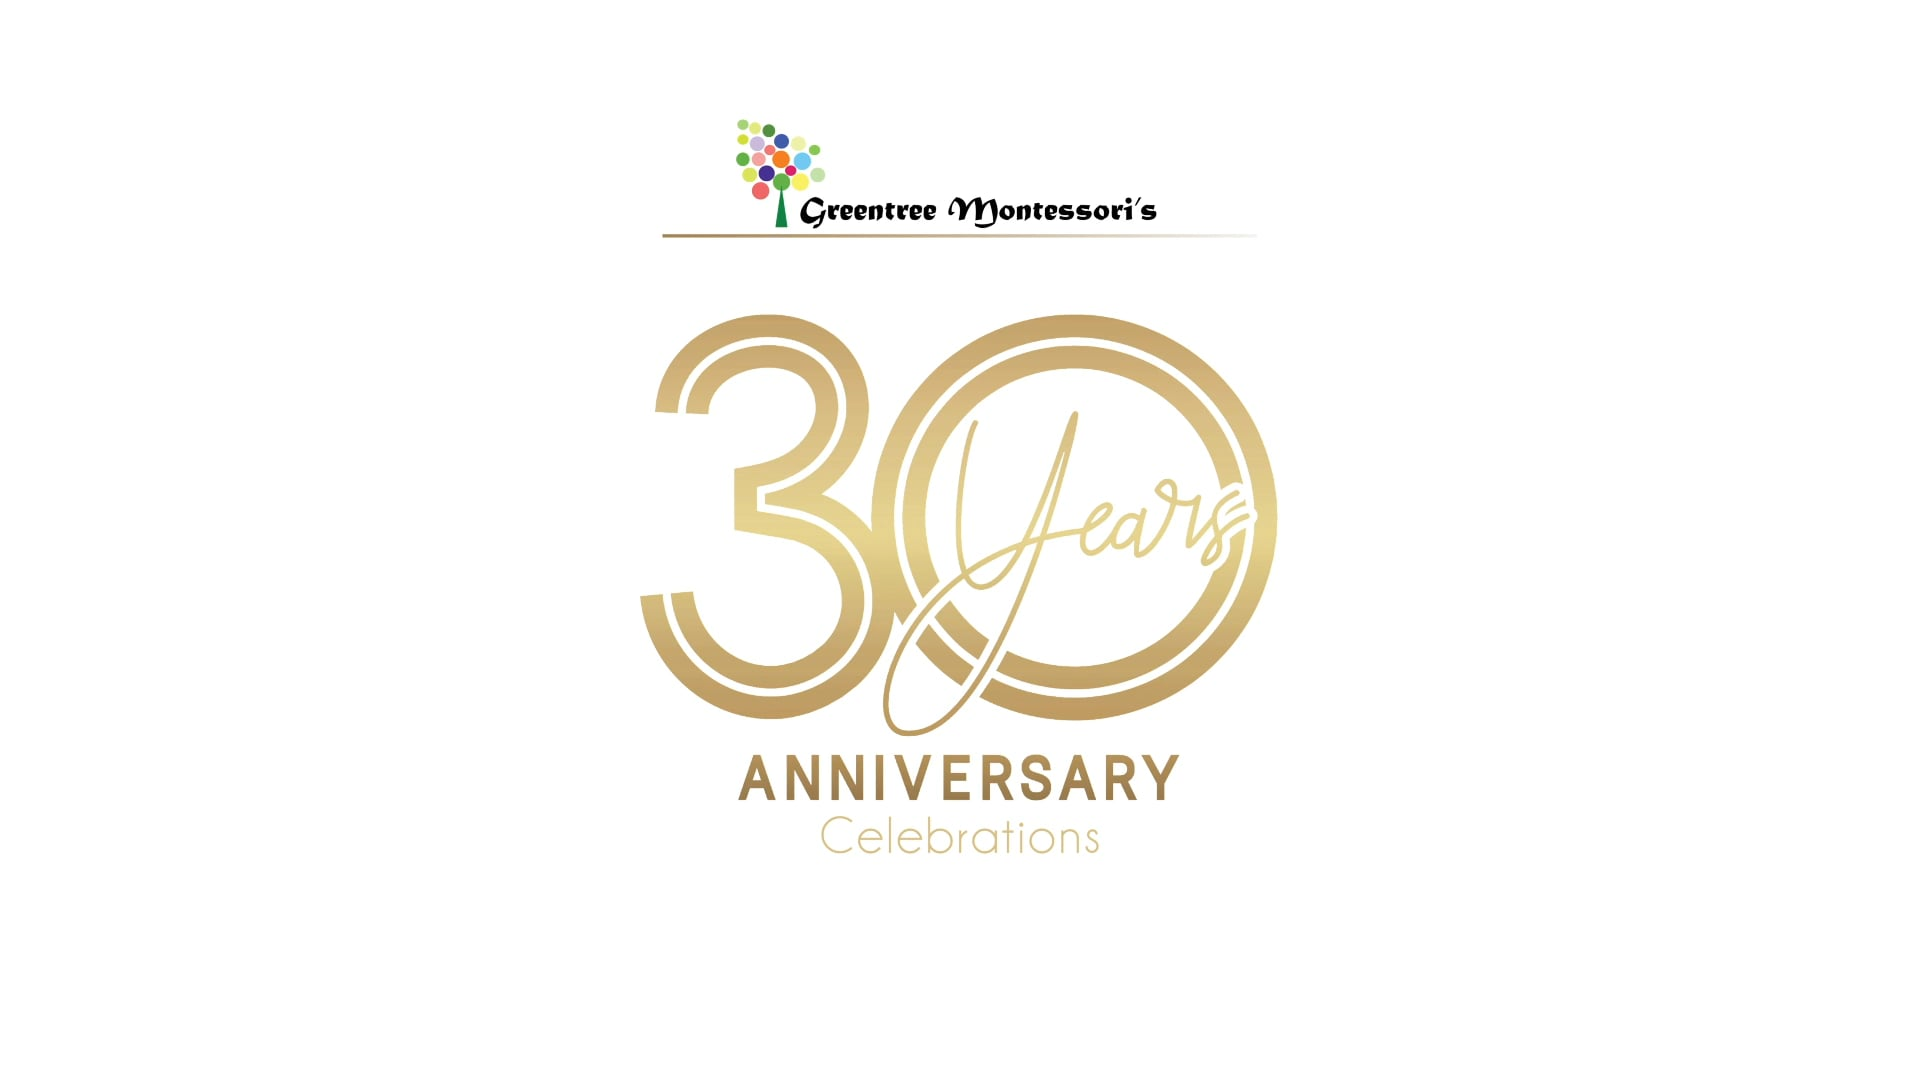 30th Anniversary Alumni Sharing - Xin Shan